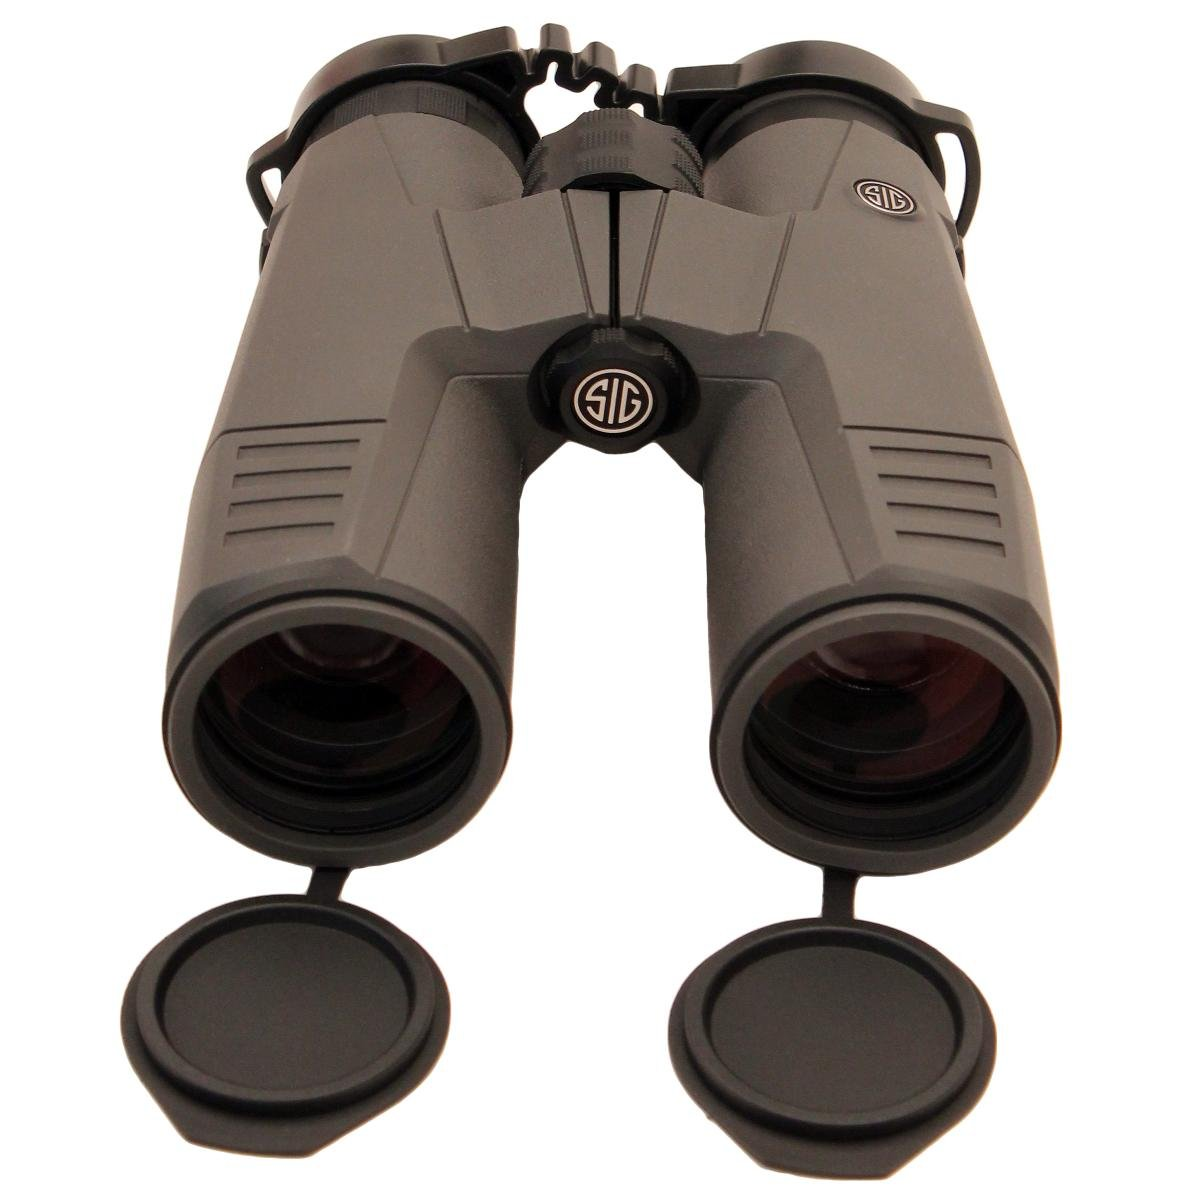 Sig Sauerズールー9 closeブリッジAK Prisms Sig x HDXガラス双眼鏡 B00UZ8AI68 9 Prisms x 45mm, キュートジュエリー:7380aa71 --- loveszsator.hu